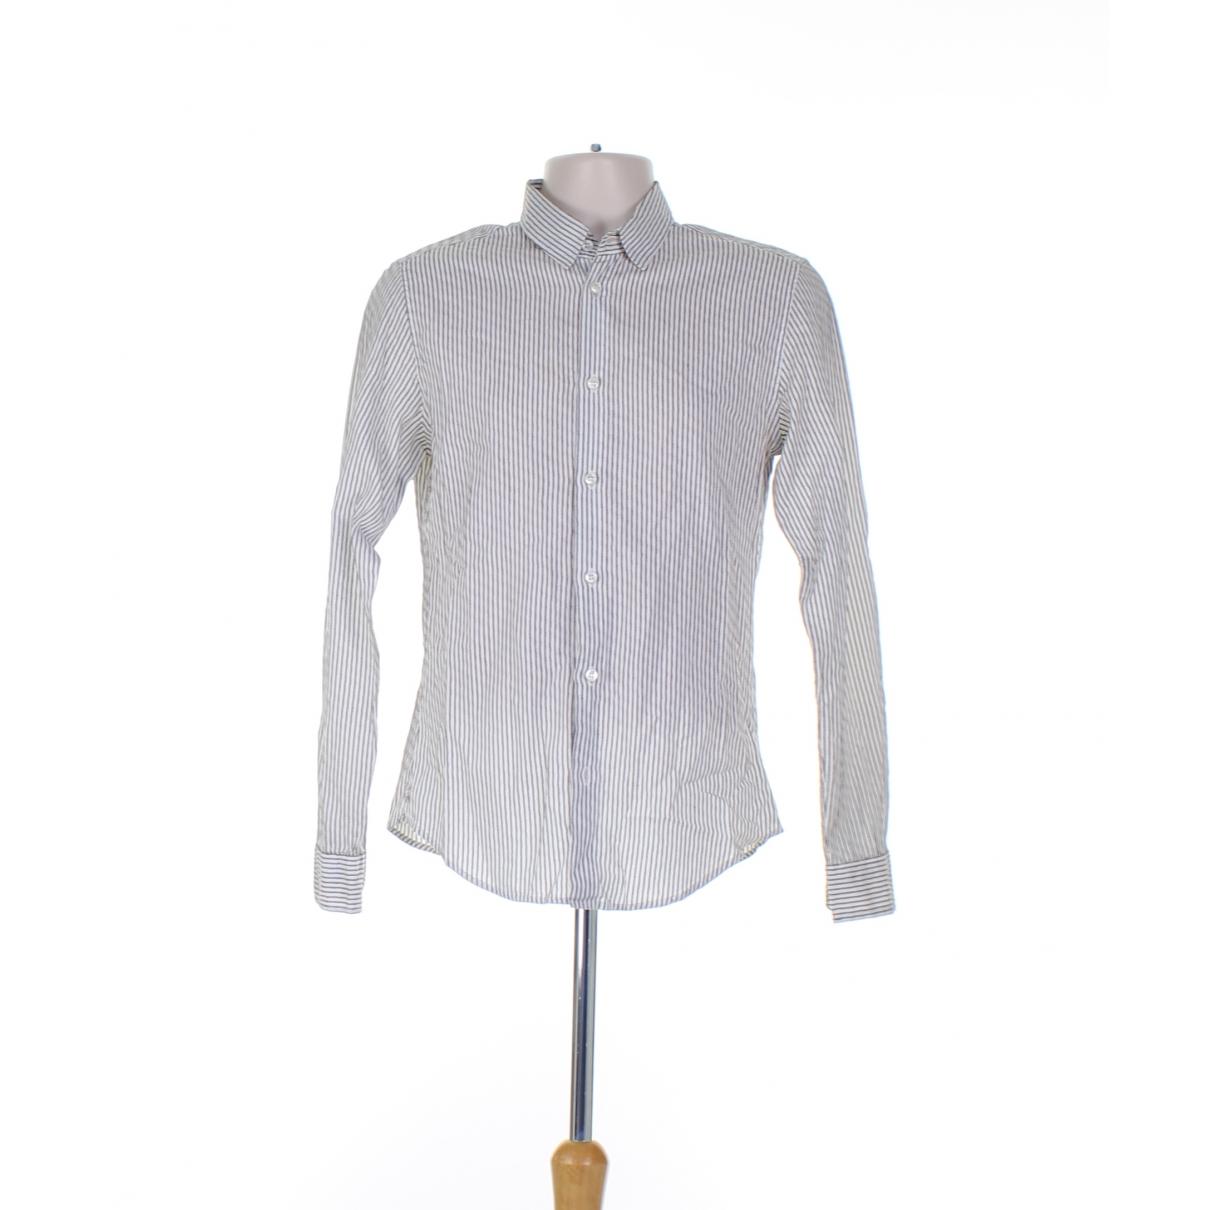 Bottega Veneta - Chemises   pour homme en coton - blanc